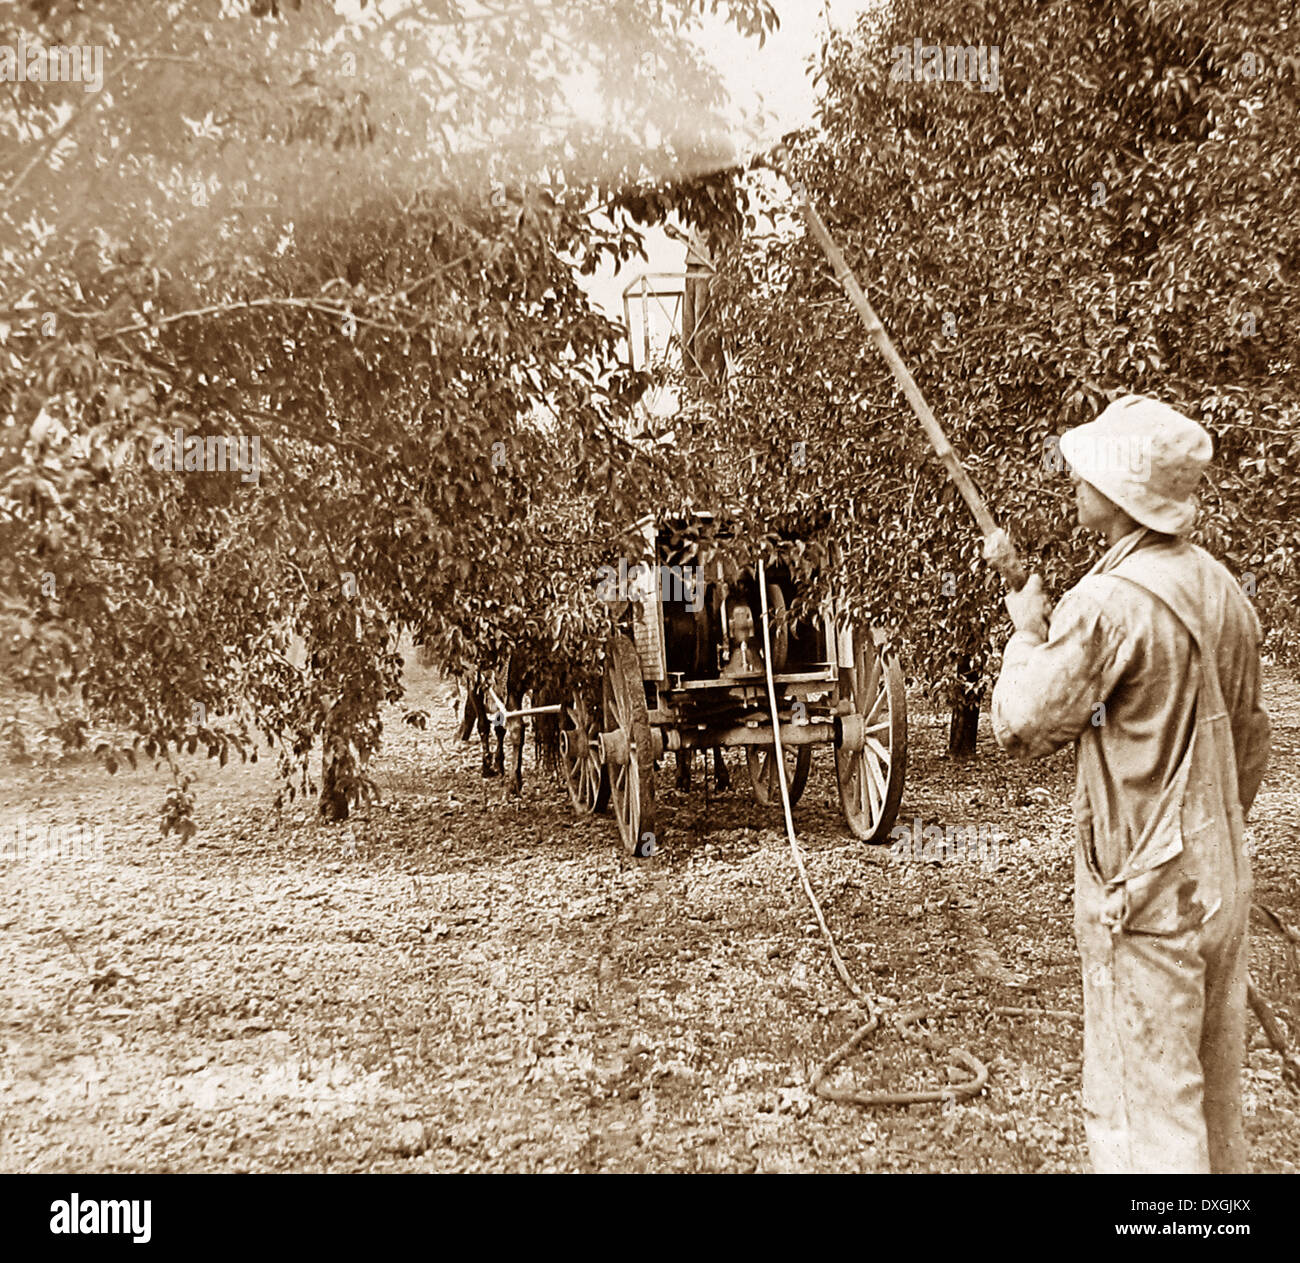 Spraying apples Hilton USA early 1900s - Stock Image